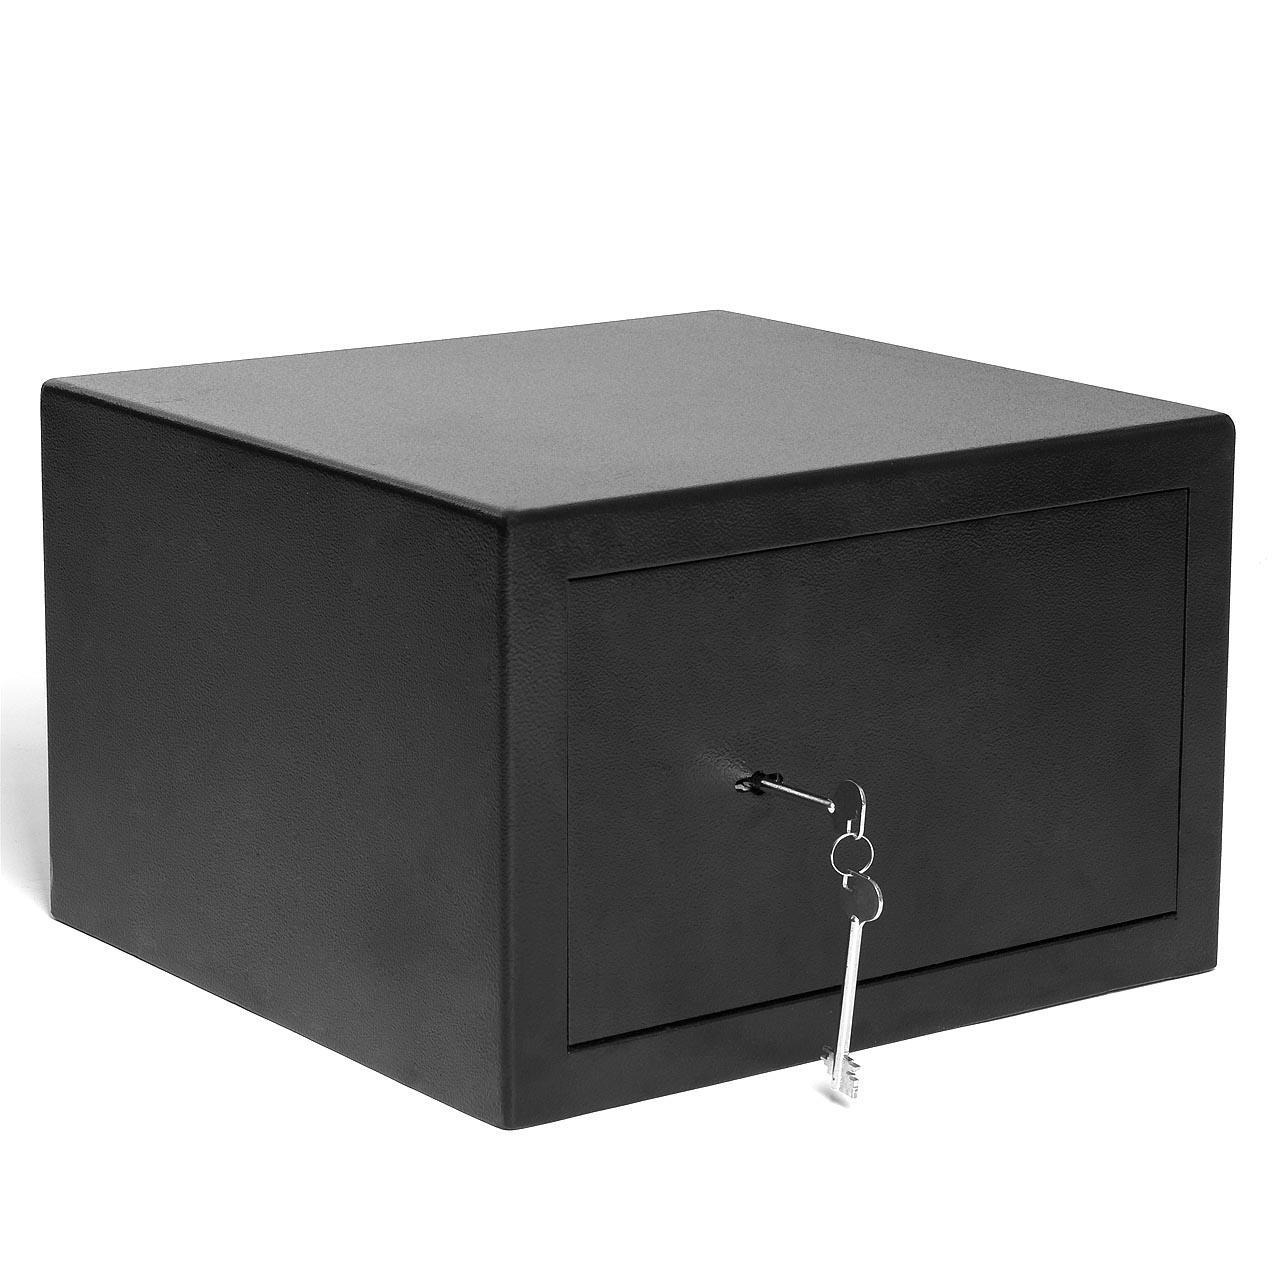 tresor waffenschrank m beltresor geldschrank wandschrank safe sicherheitsstufe b. Black Bedroom Furniture Sets. Home Design Ideas